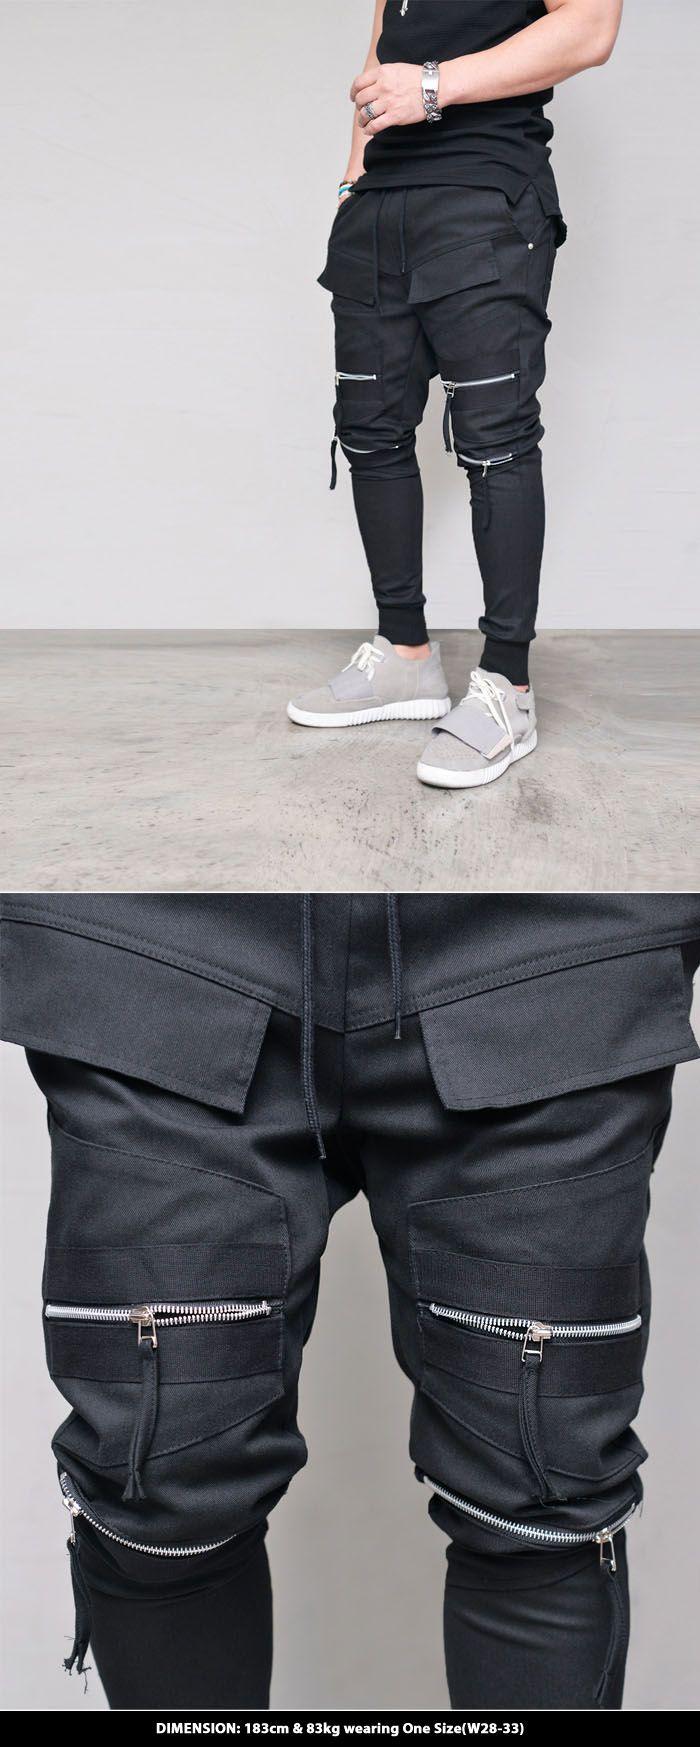 Best 25+ Mens sweatpants ideas on Pinterest